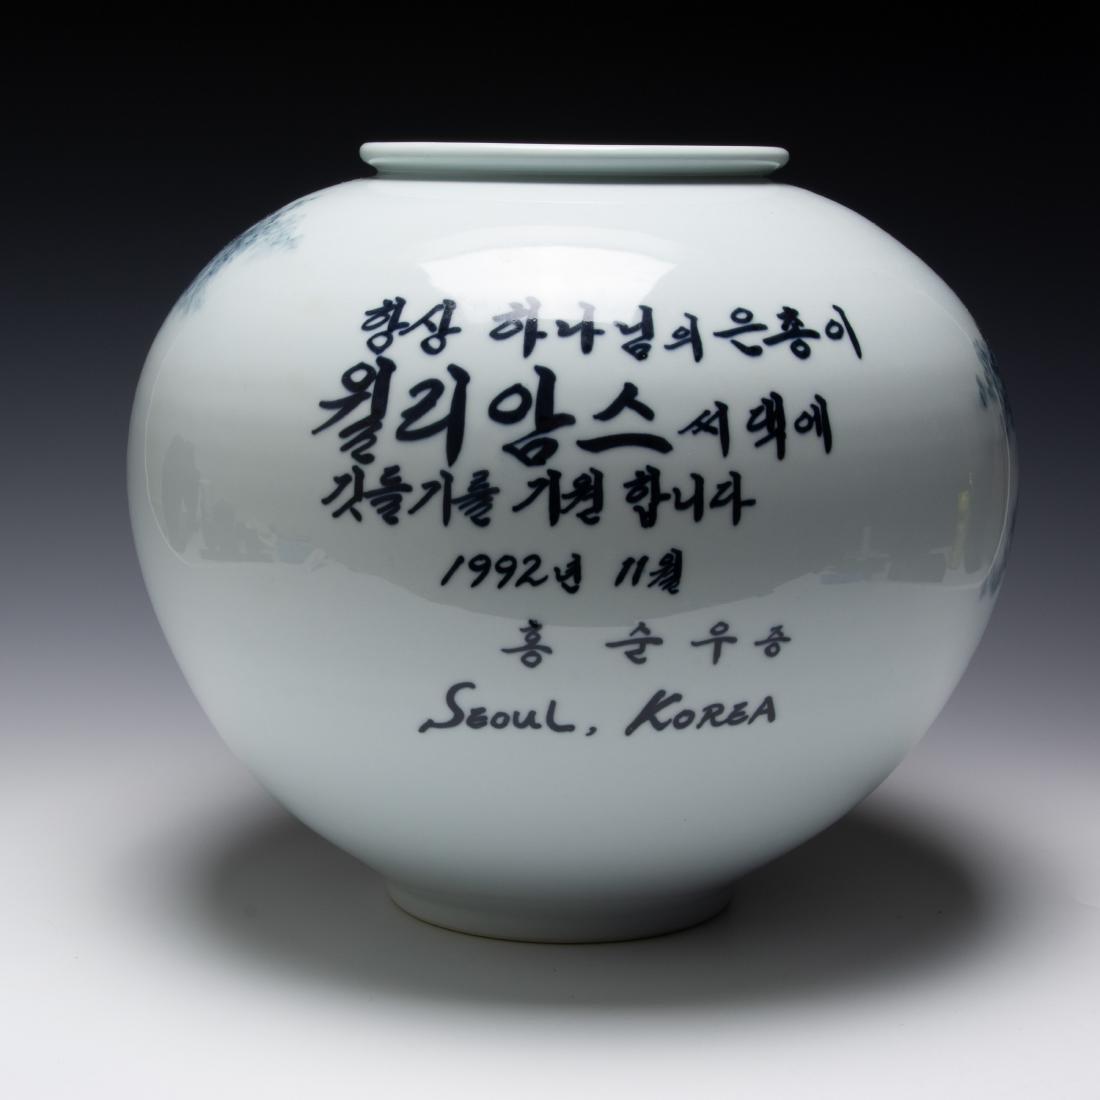 Blue & White Korean Vase w/ Dedication, 1992 - 4